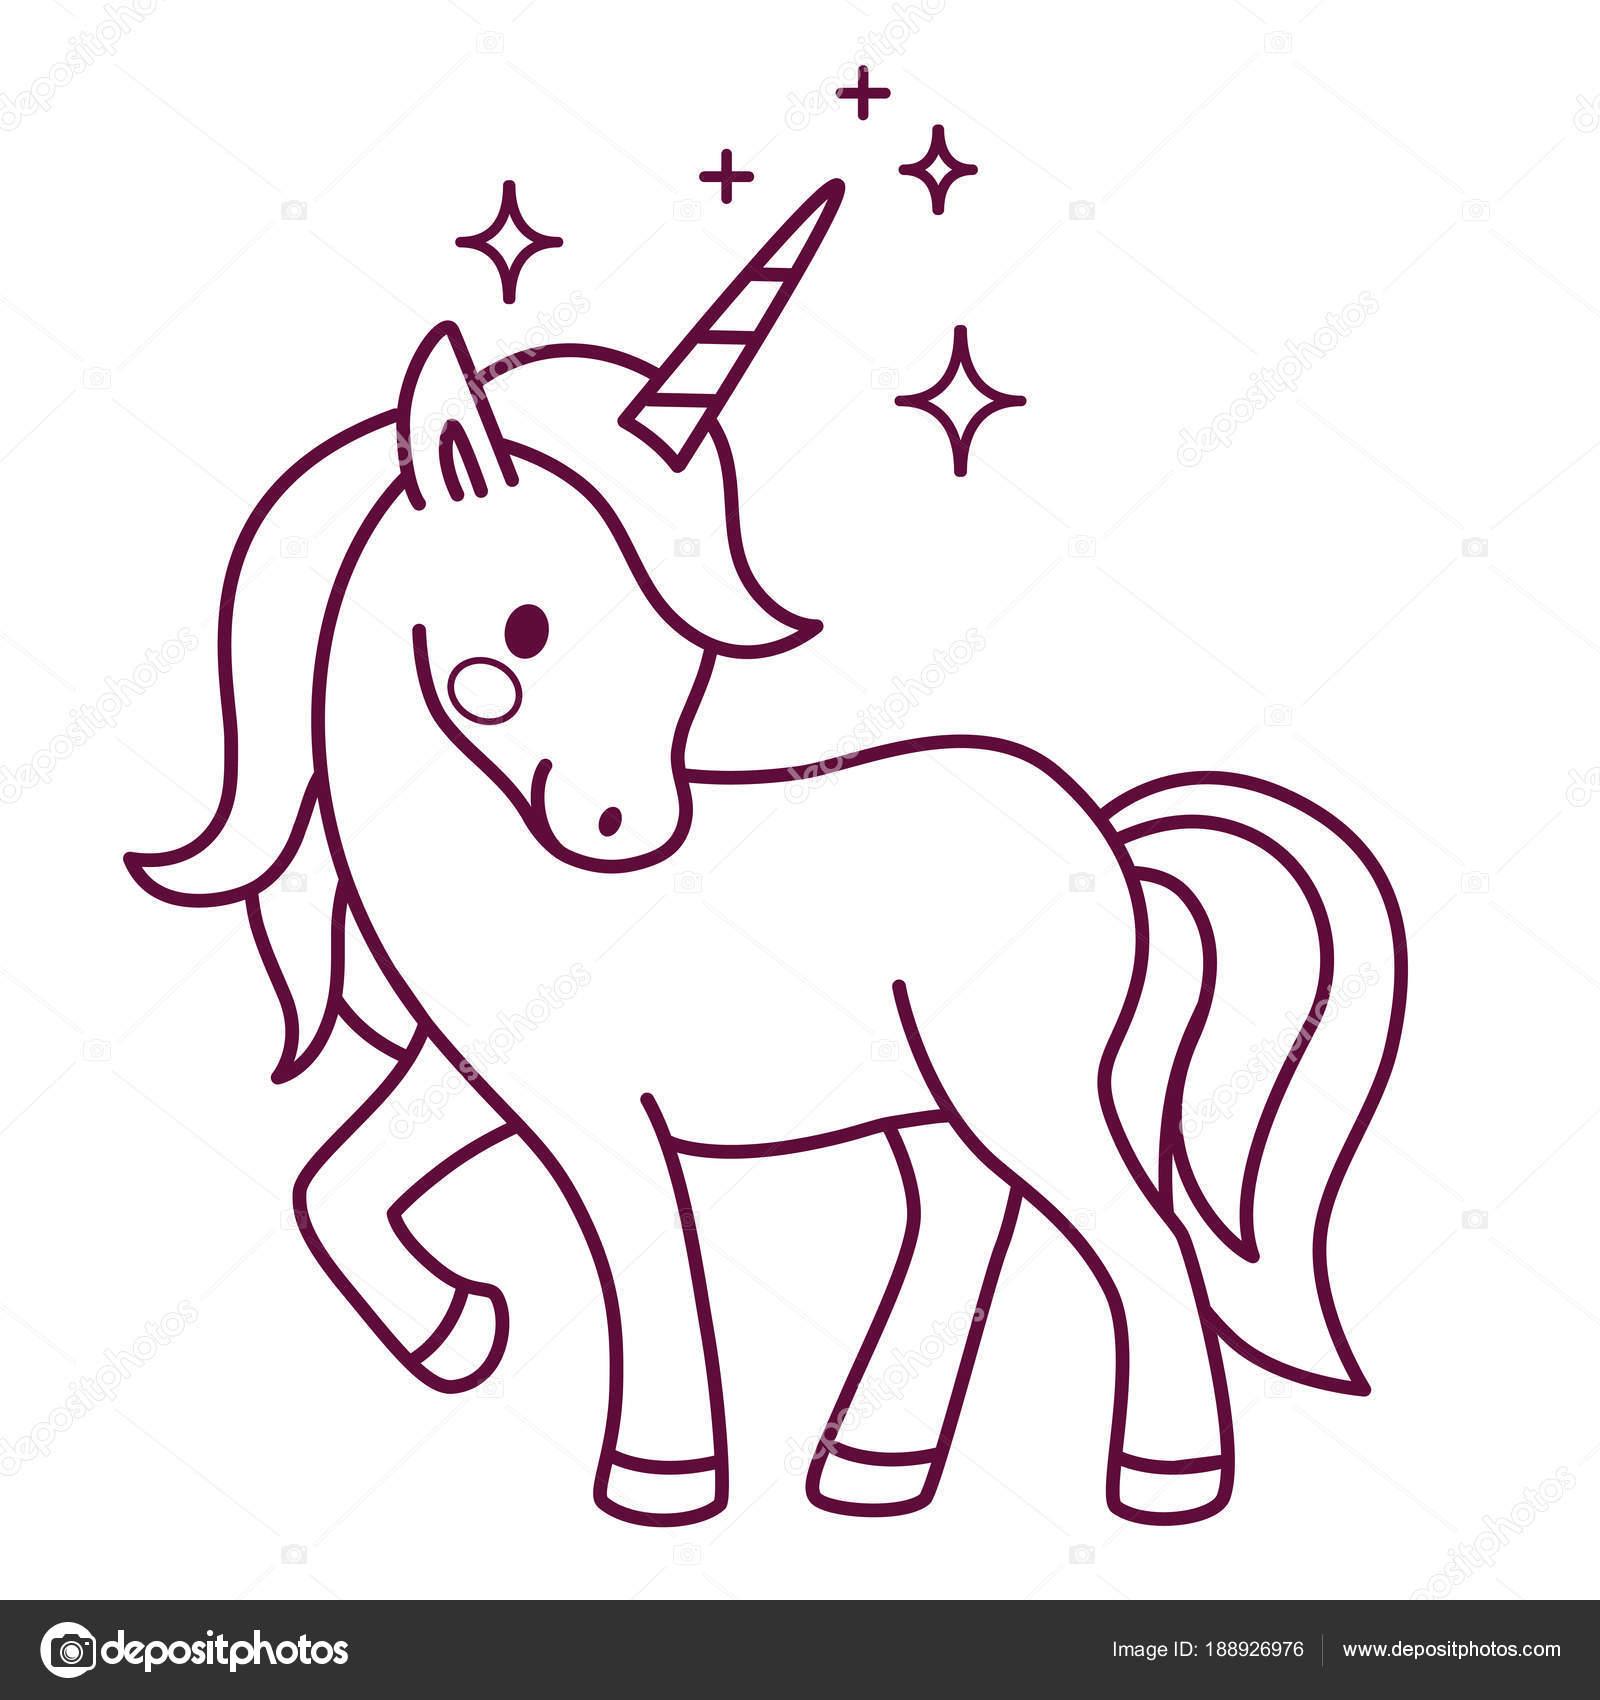 Fotos Unicornios Vector De Dibujos Animados Simples Lindo